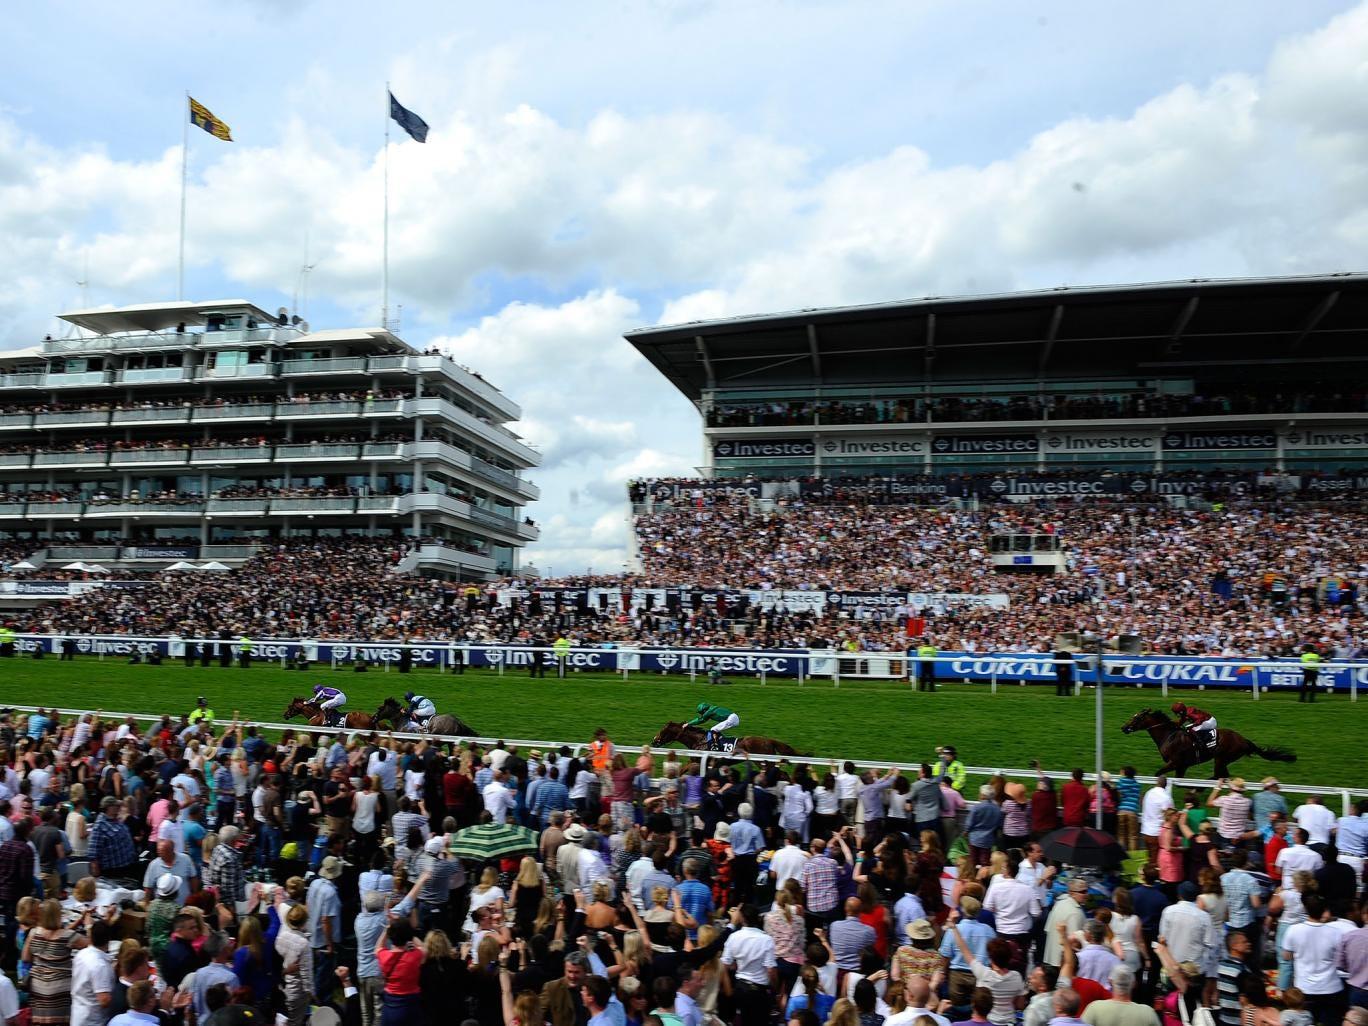 Joseph O'Brien riding Australia win The Investec Derby at Epsom racecourse on June 07, 2014 in Epsom, England.